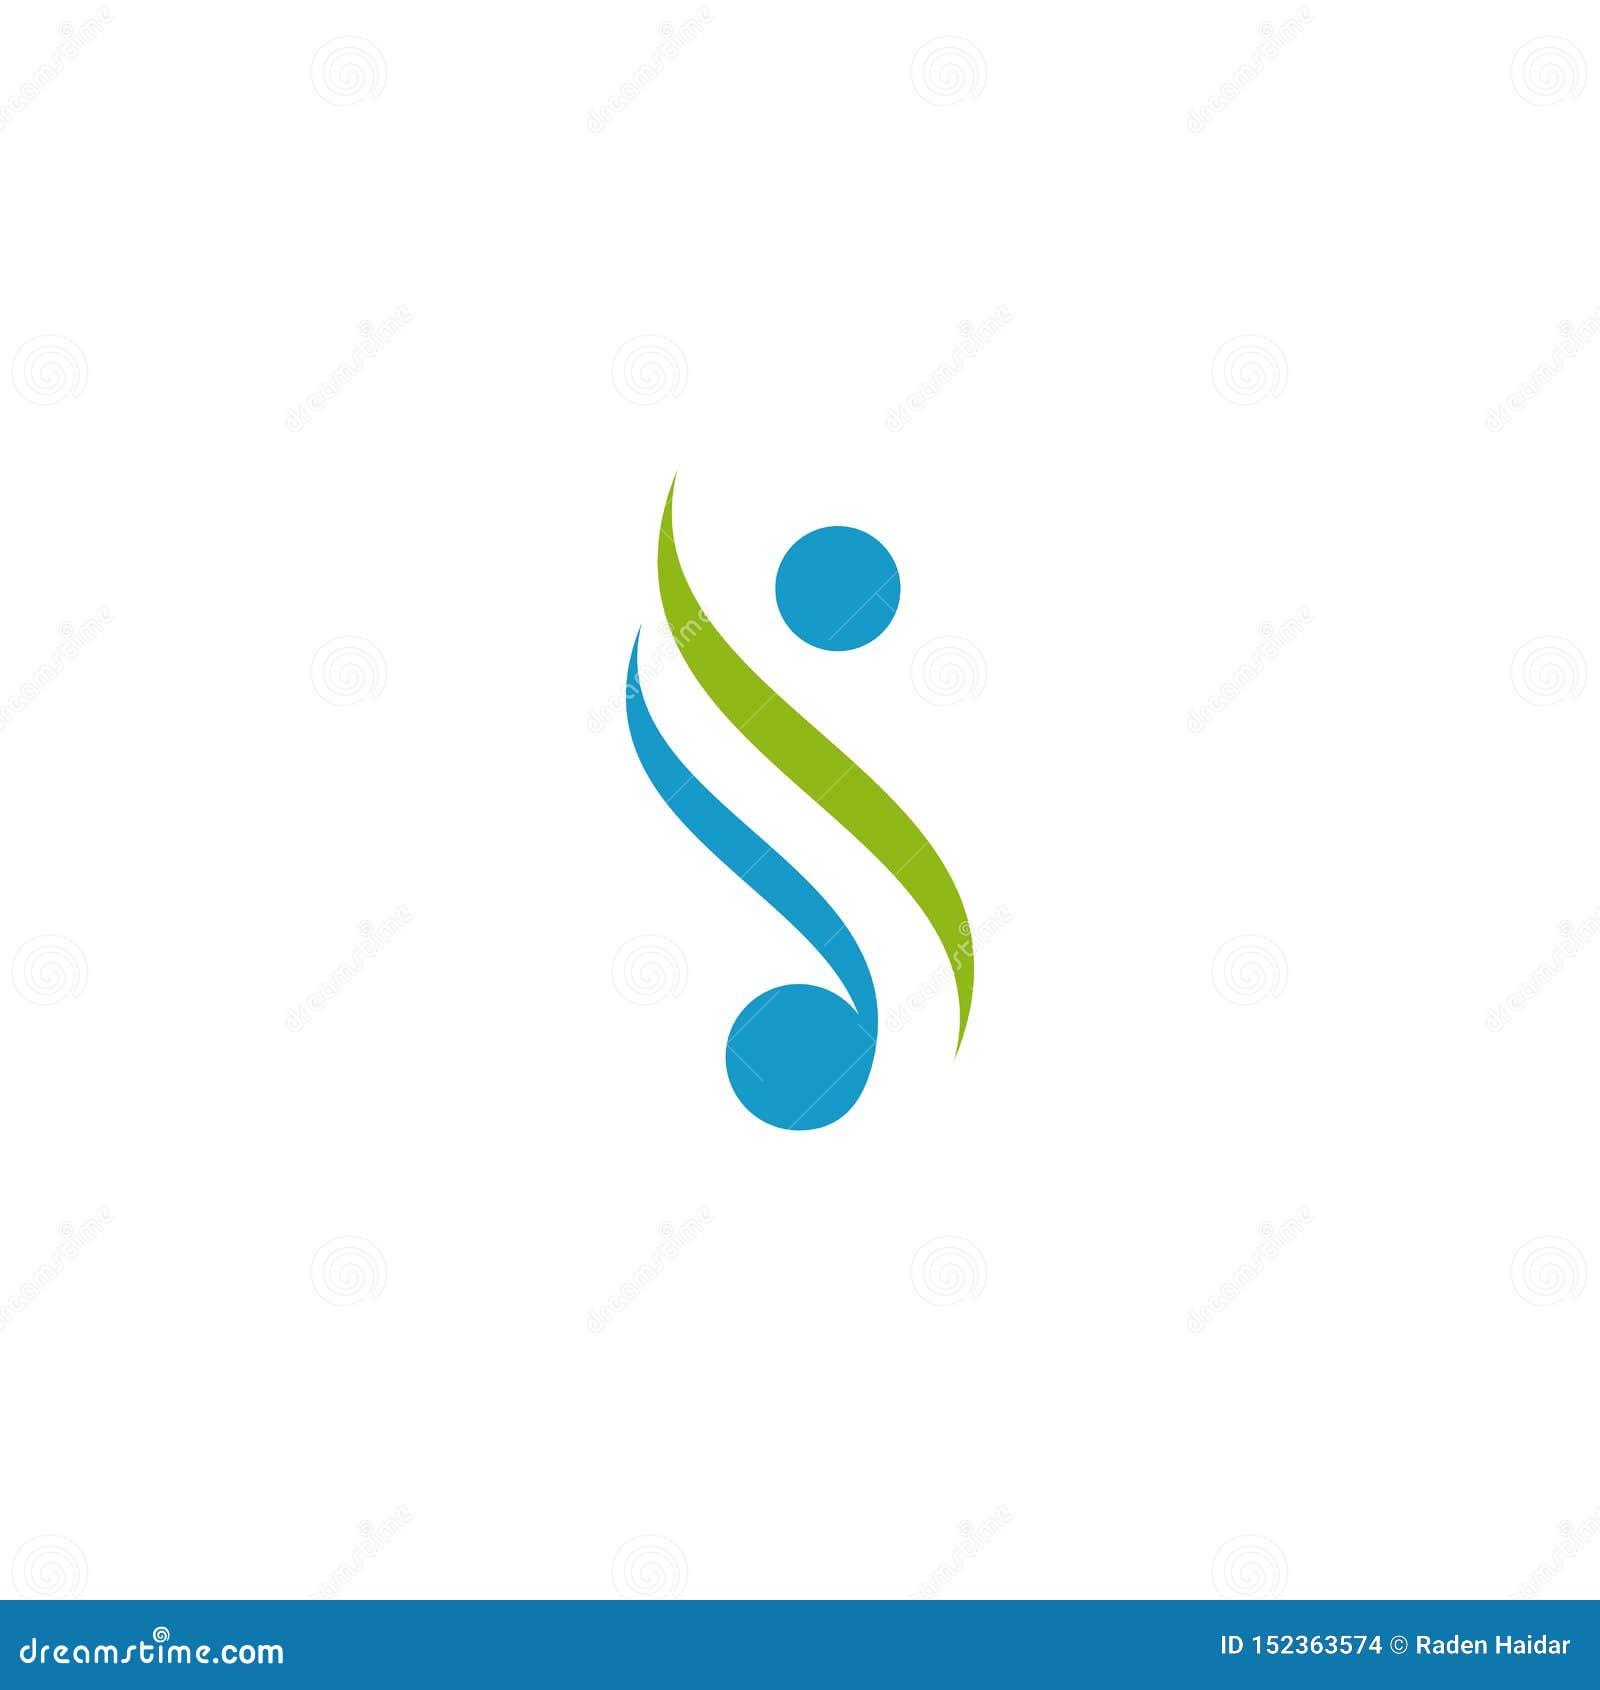 Conception humaine de logo Style minimaliste simple